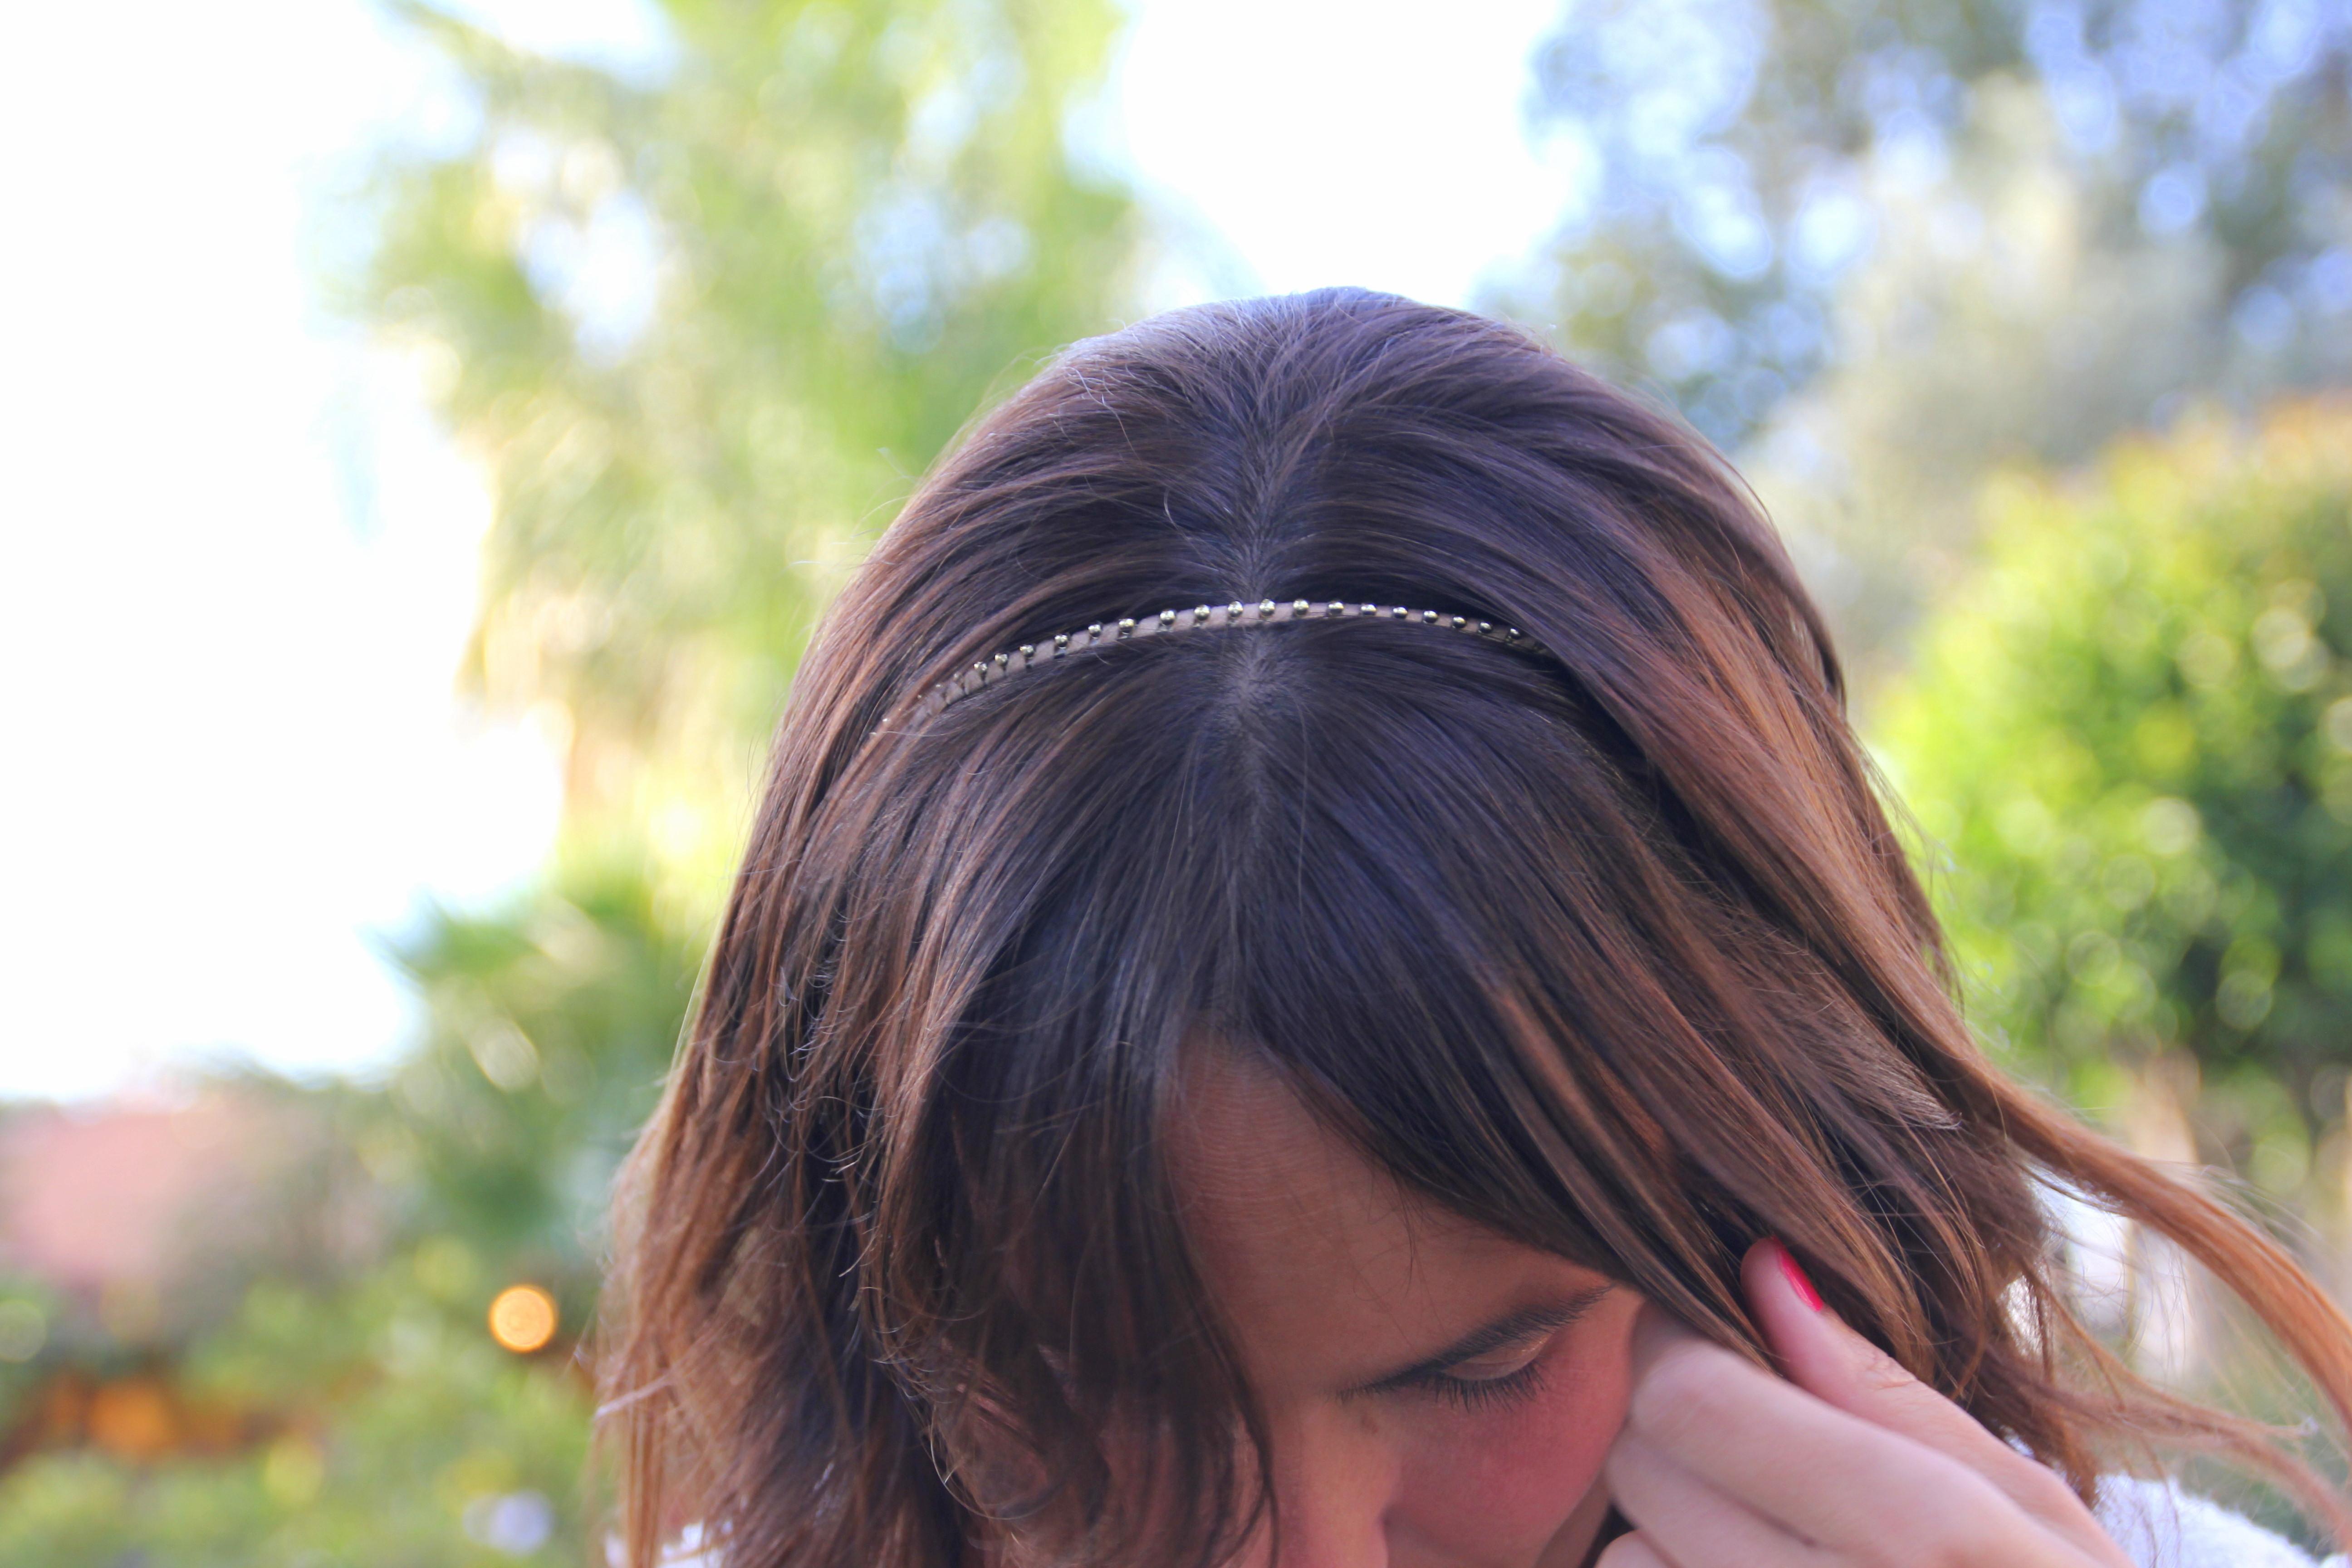 Clutch Zara. Diadema/Headband Sfera. Chaqueta/Jacket Zara (PARECIDA AQUÍ)